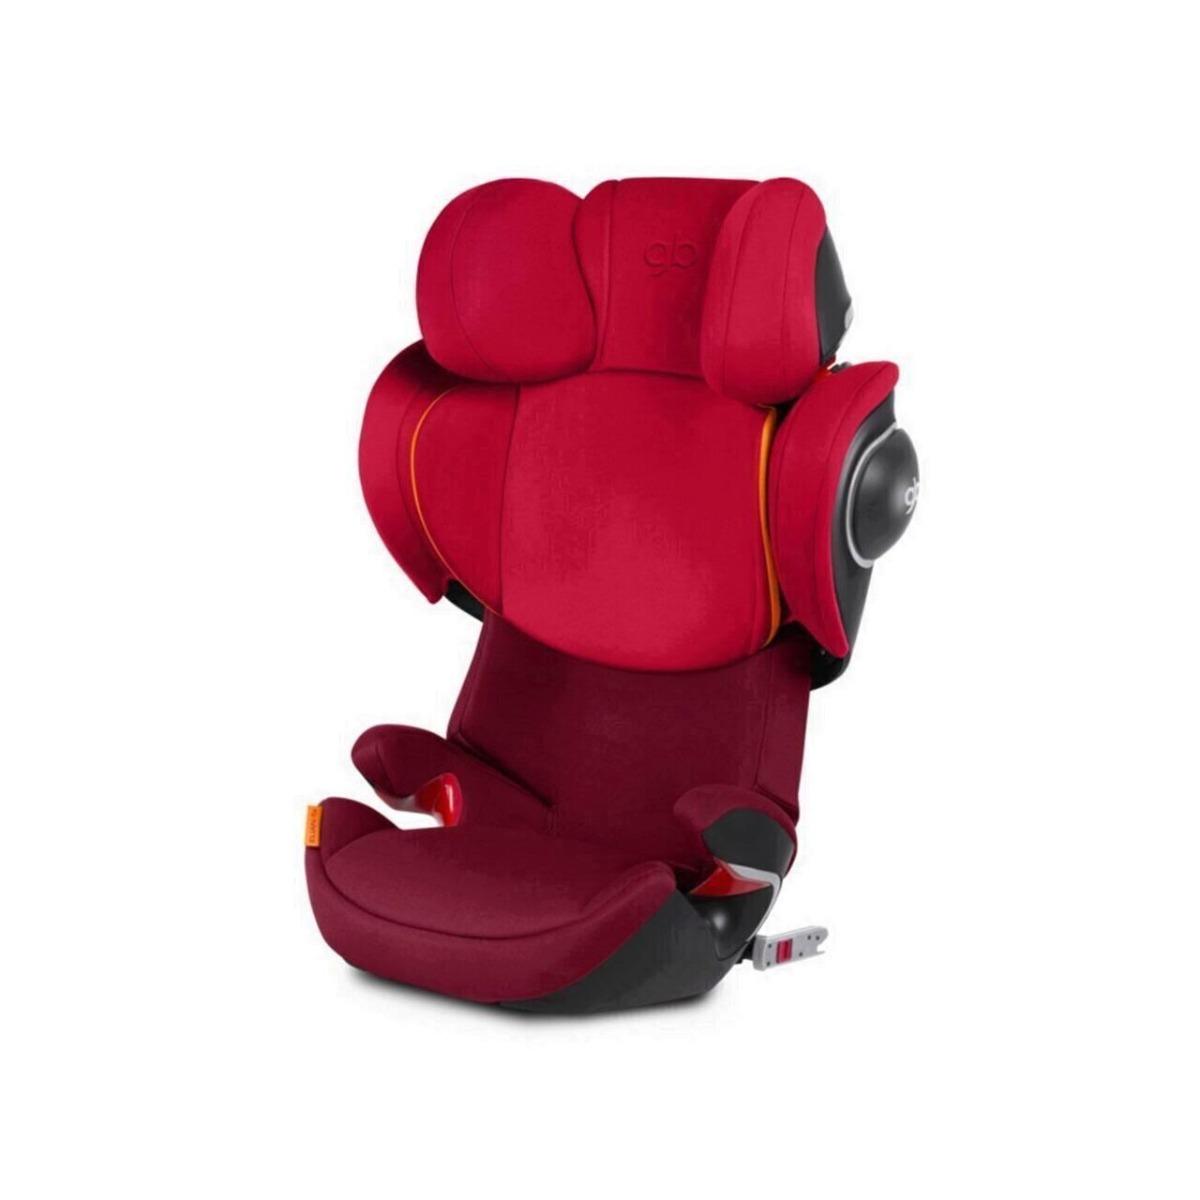 Scaun auto cu Isofix GB Elian-Fix Dragonfire Red, 15 - 36 Kg imagine